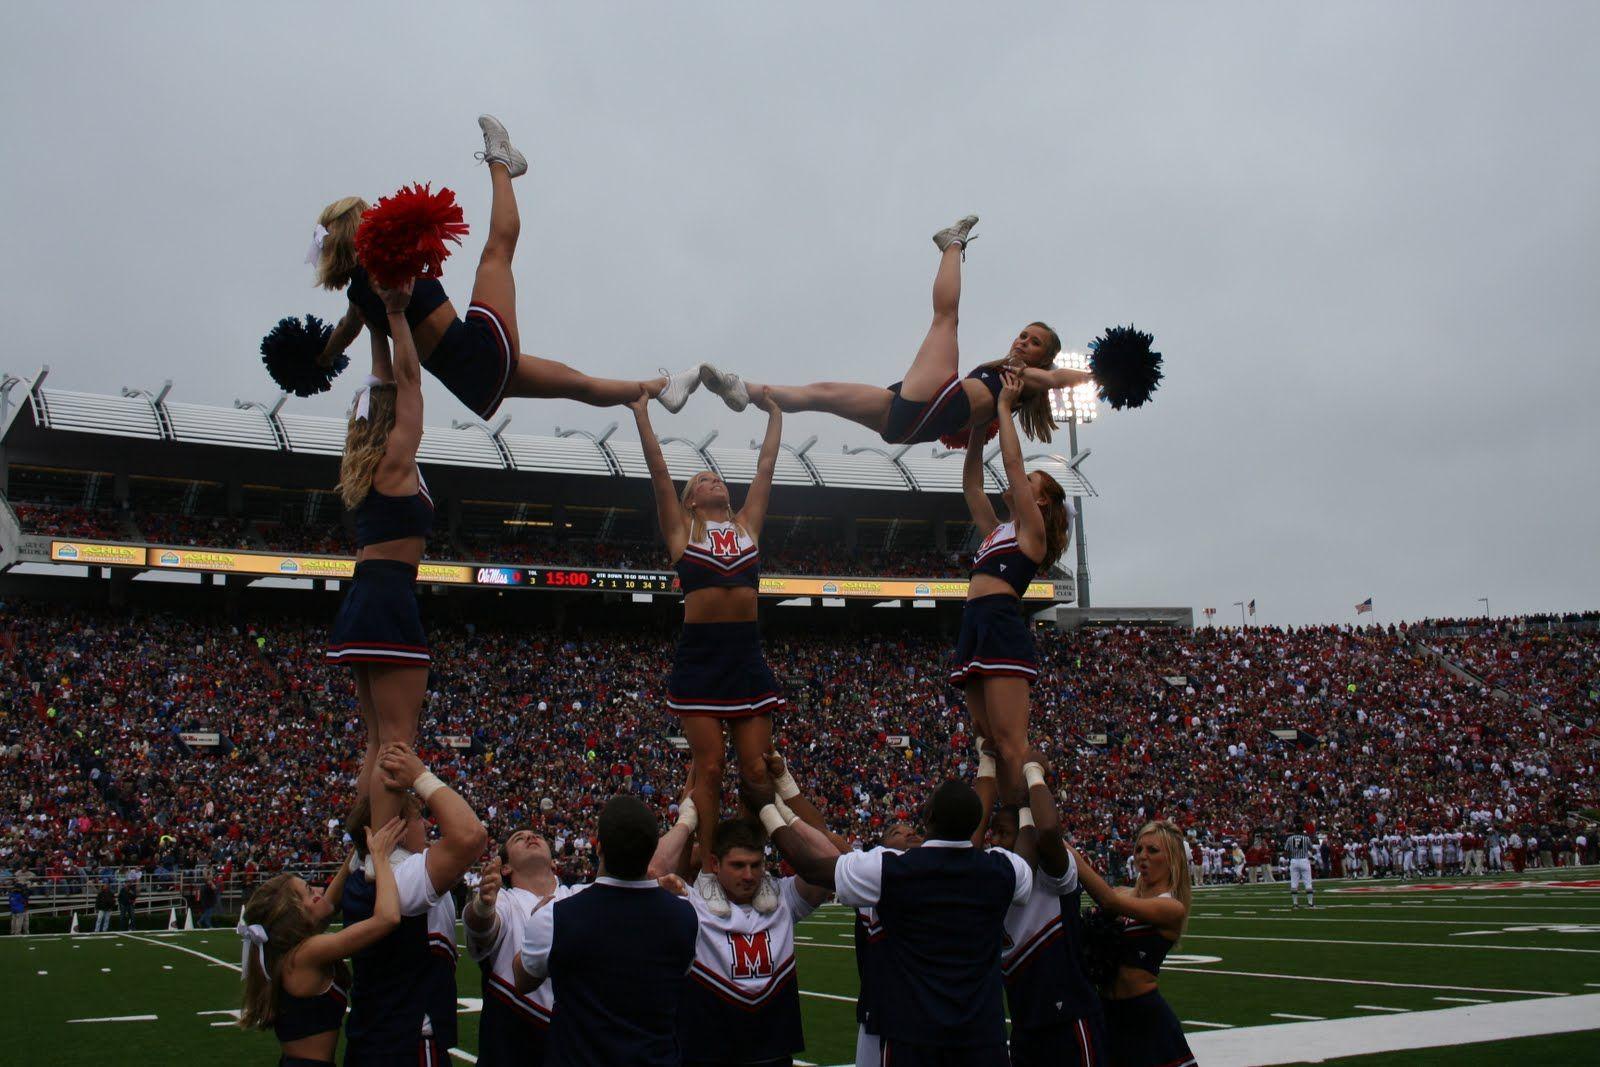 Ole Miss Cheerleading Cheer College Collegiate Hottytoddy Sports Game Stunt Cheerleaders Football Fiel College Cheer Cheerleading Cheerleading Stunt